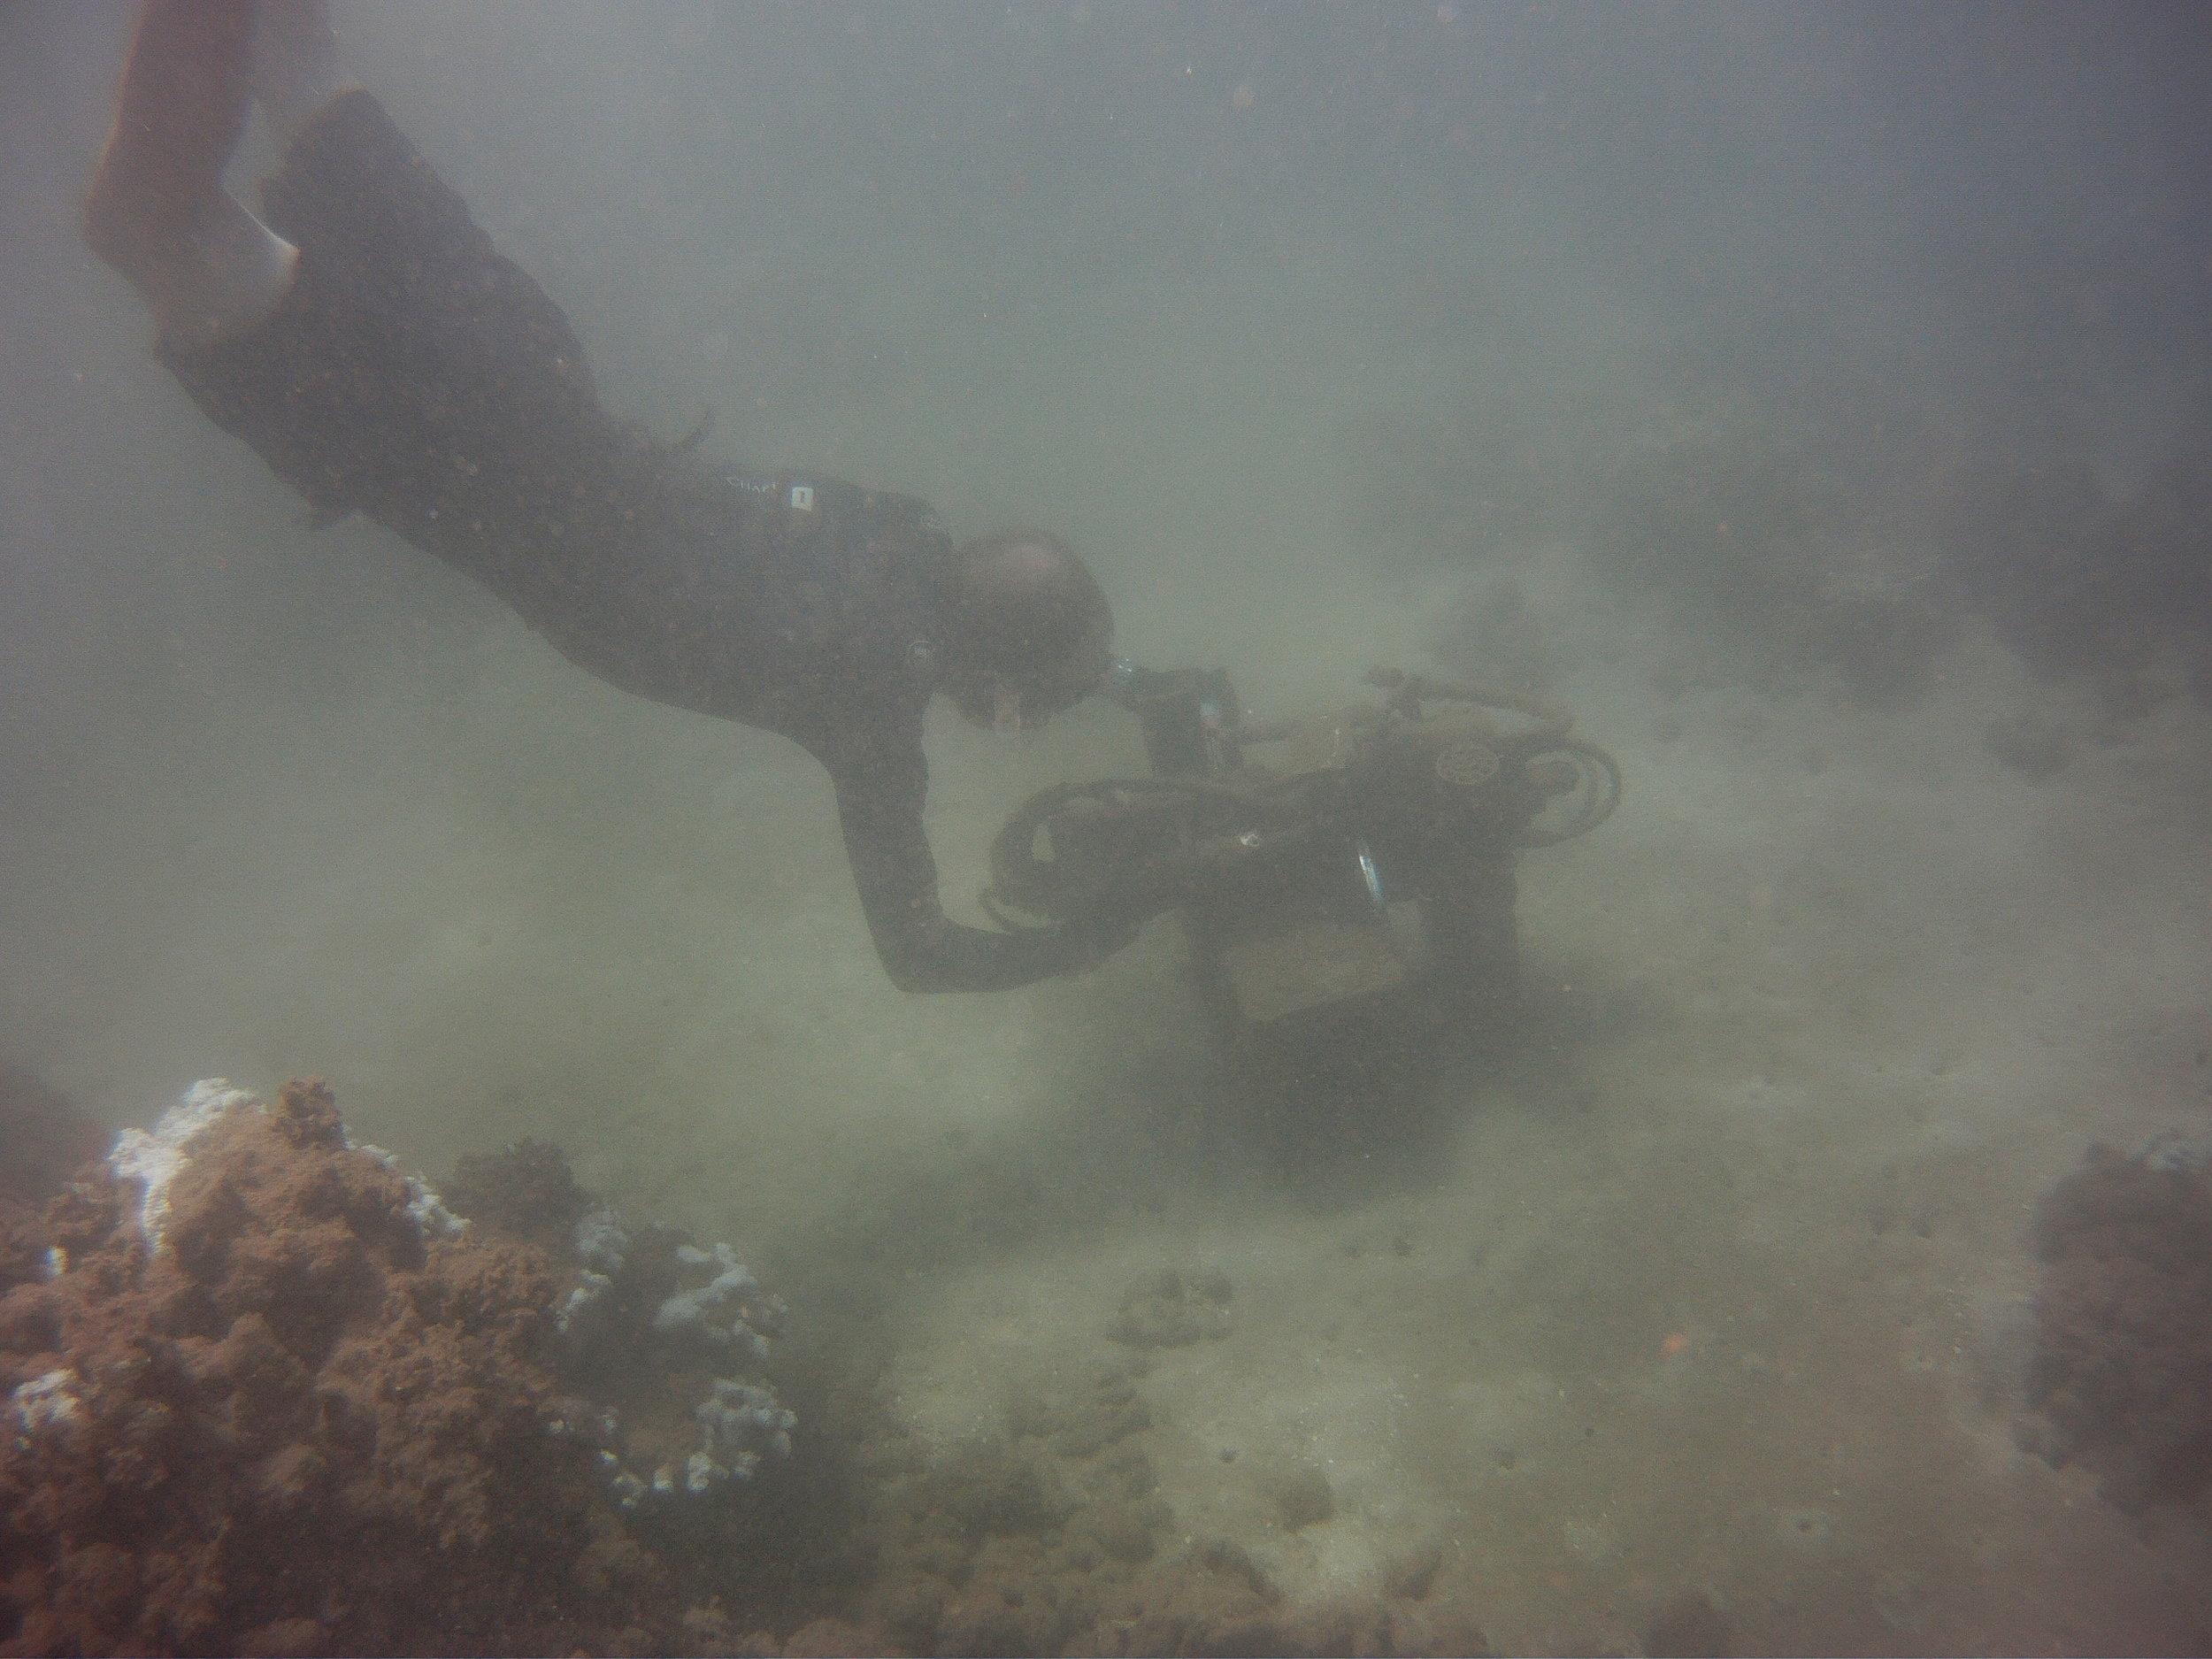 Instrument deployment on Lanai